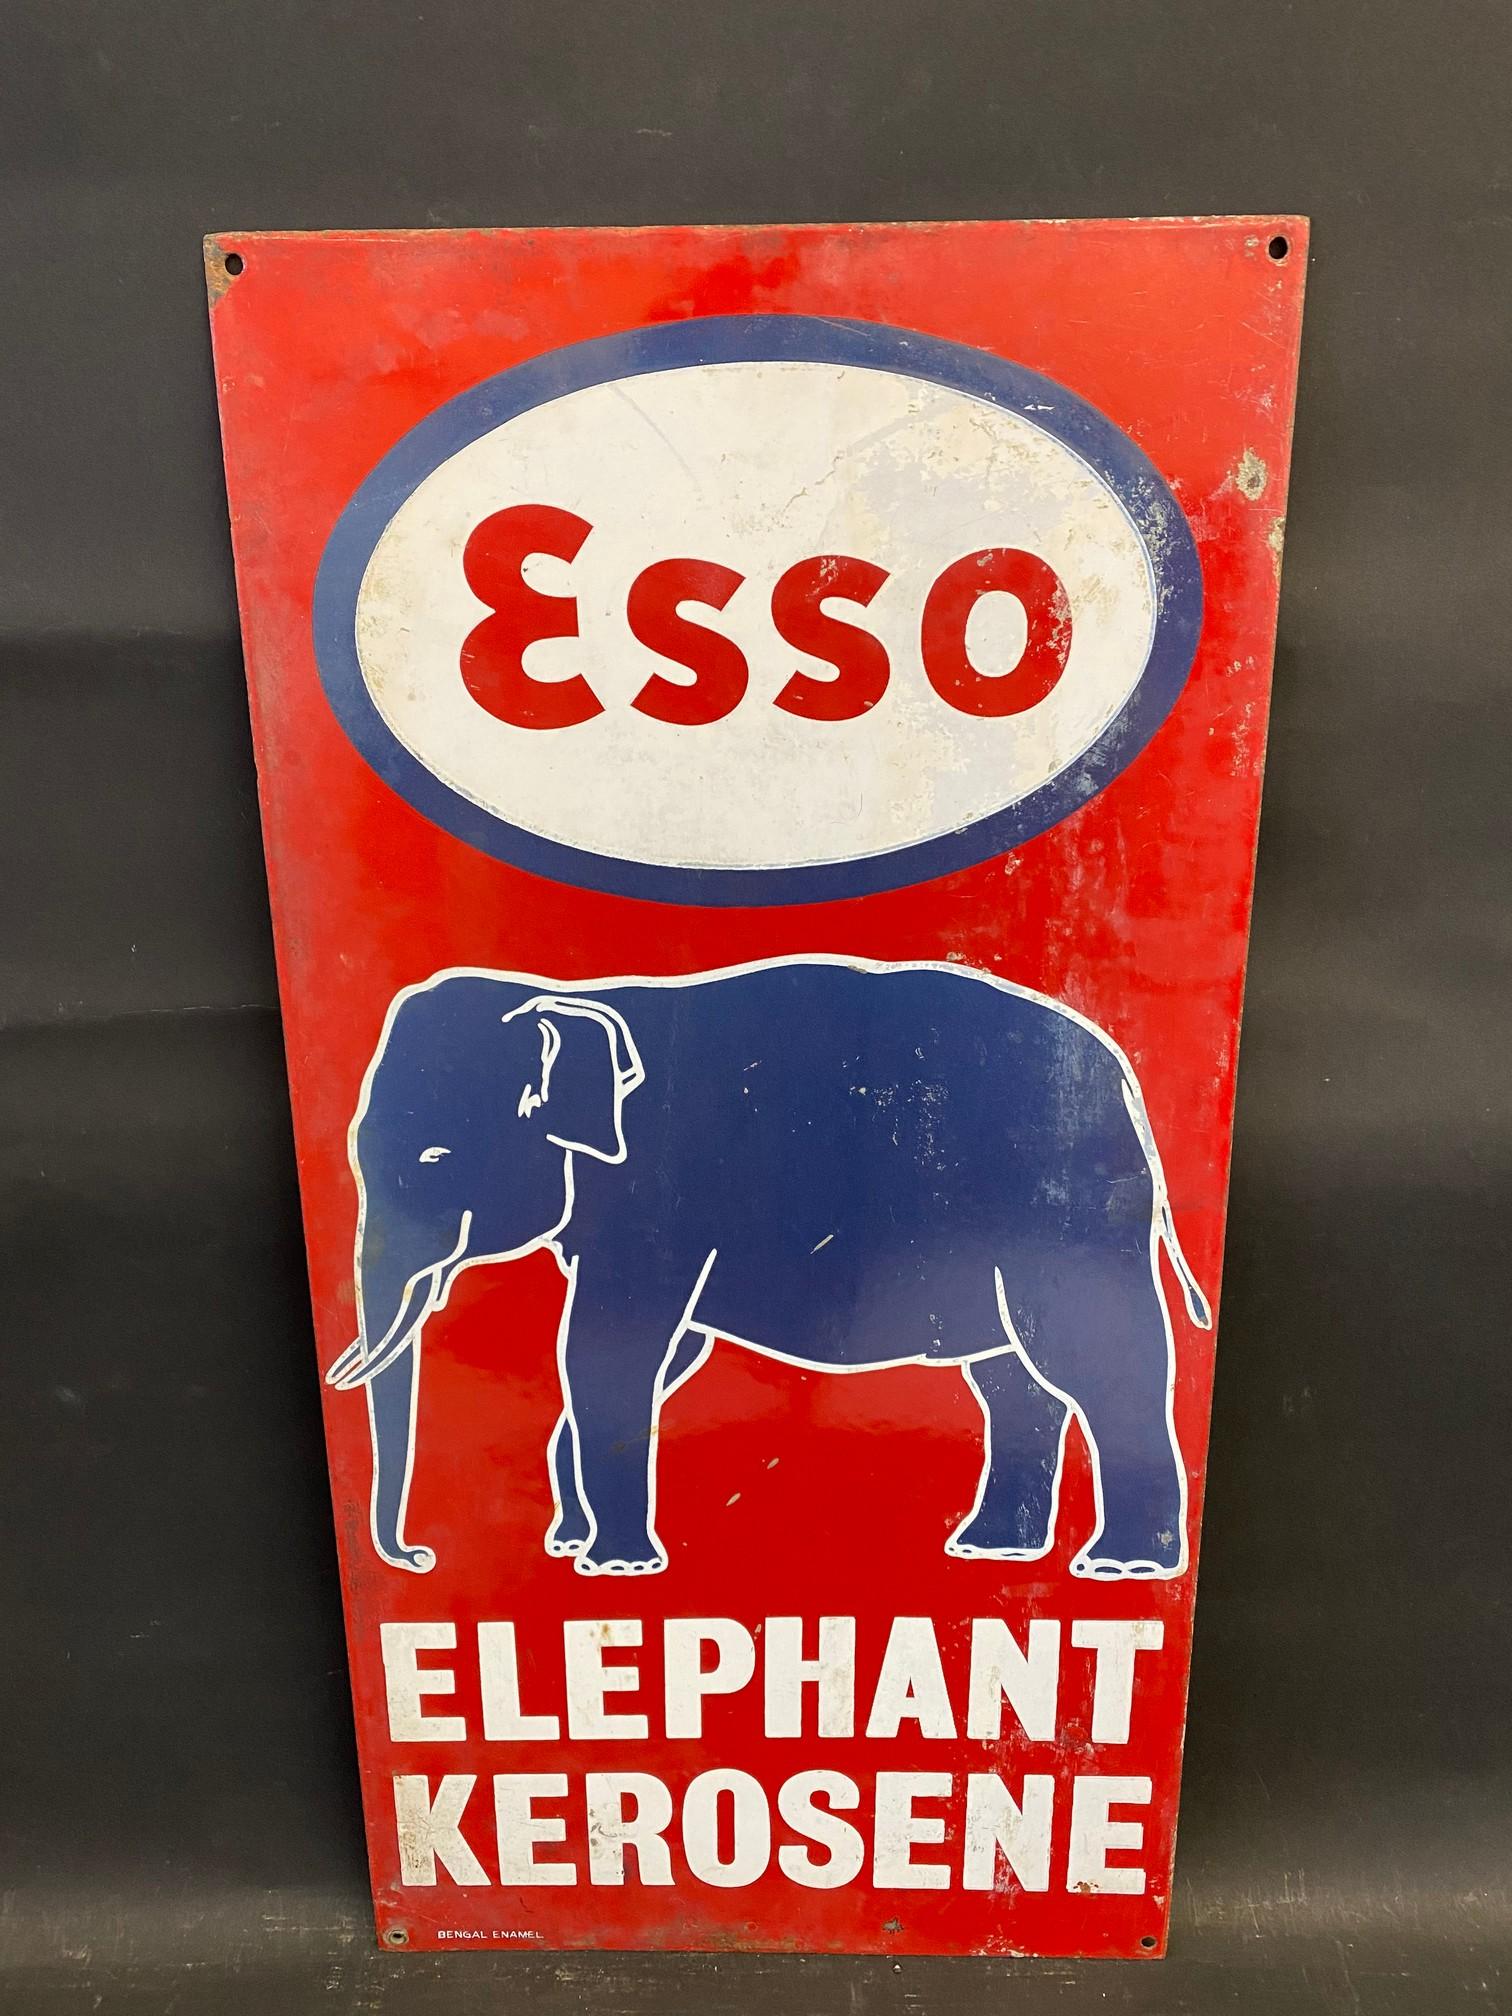 "An Indian Esso Elephant Kerosene pictorial enamel sign by Bengal Enamel, 12 x 24""."